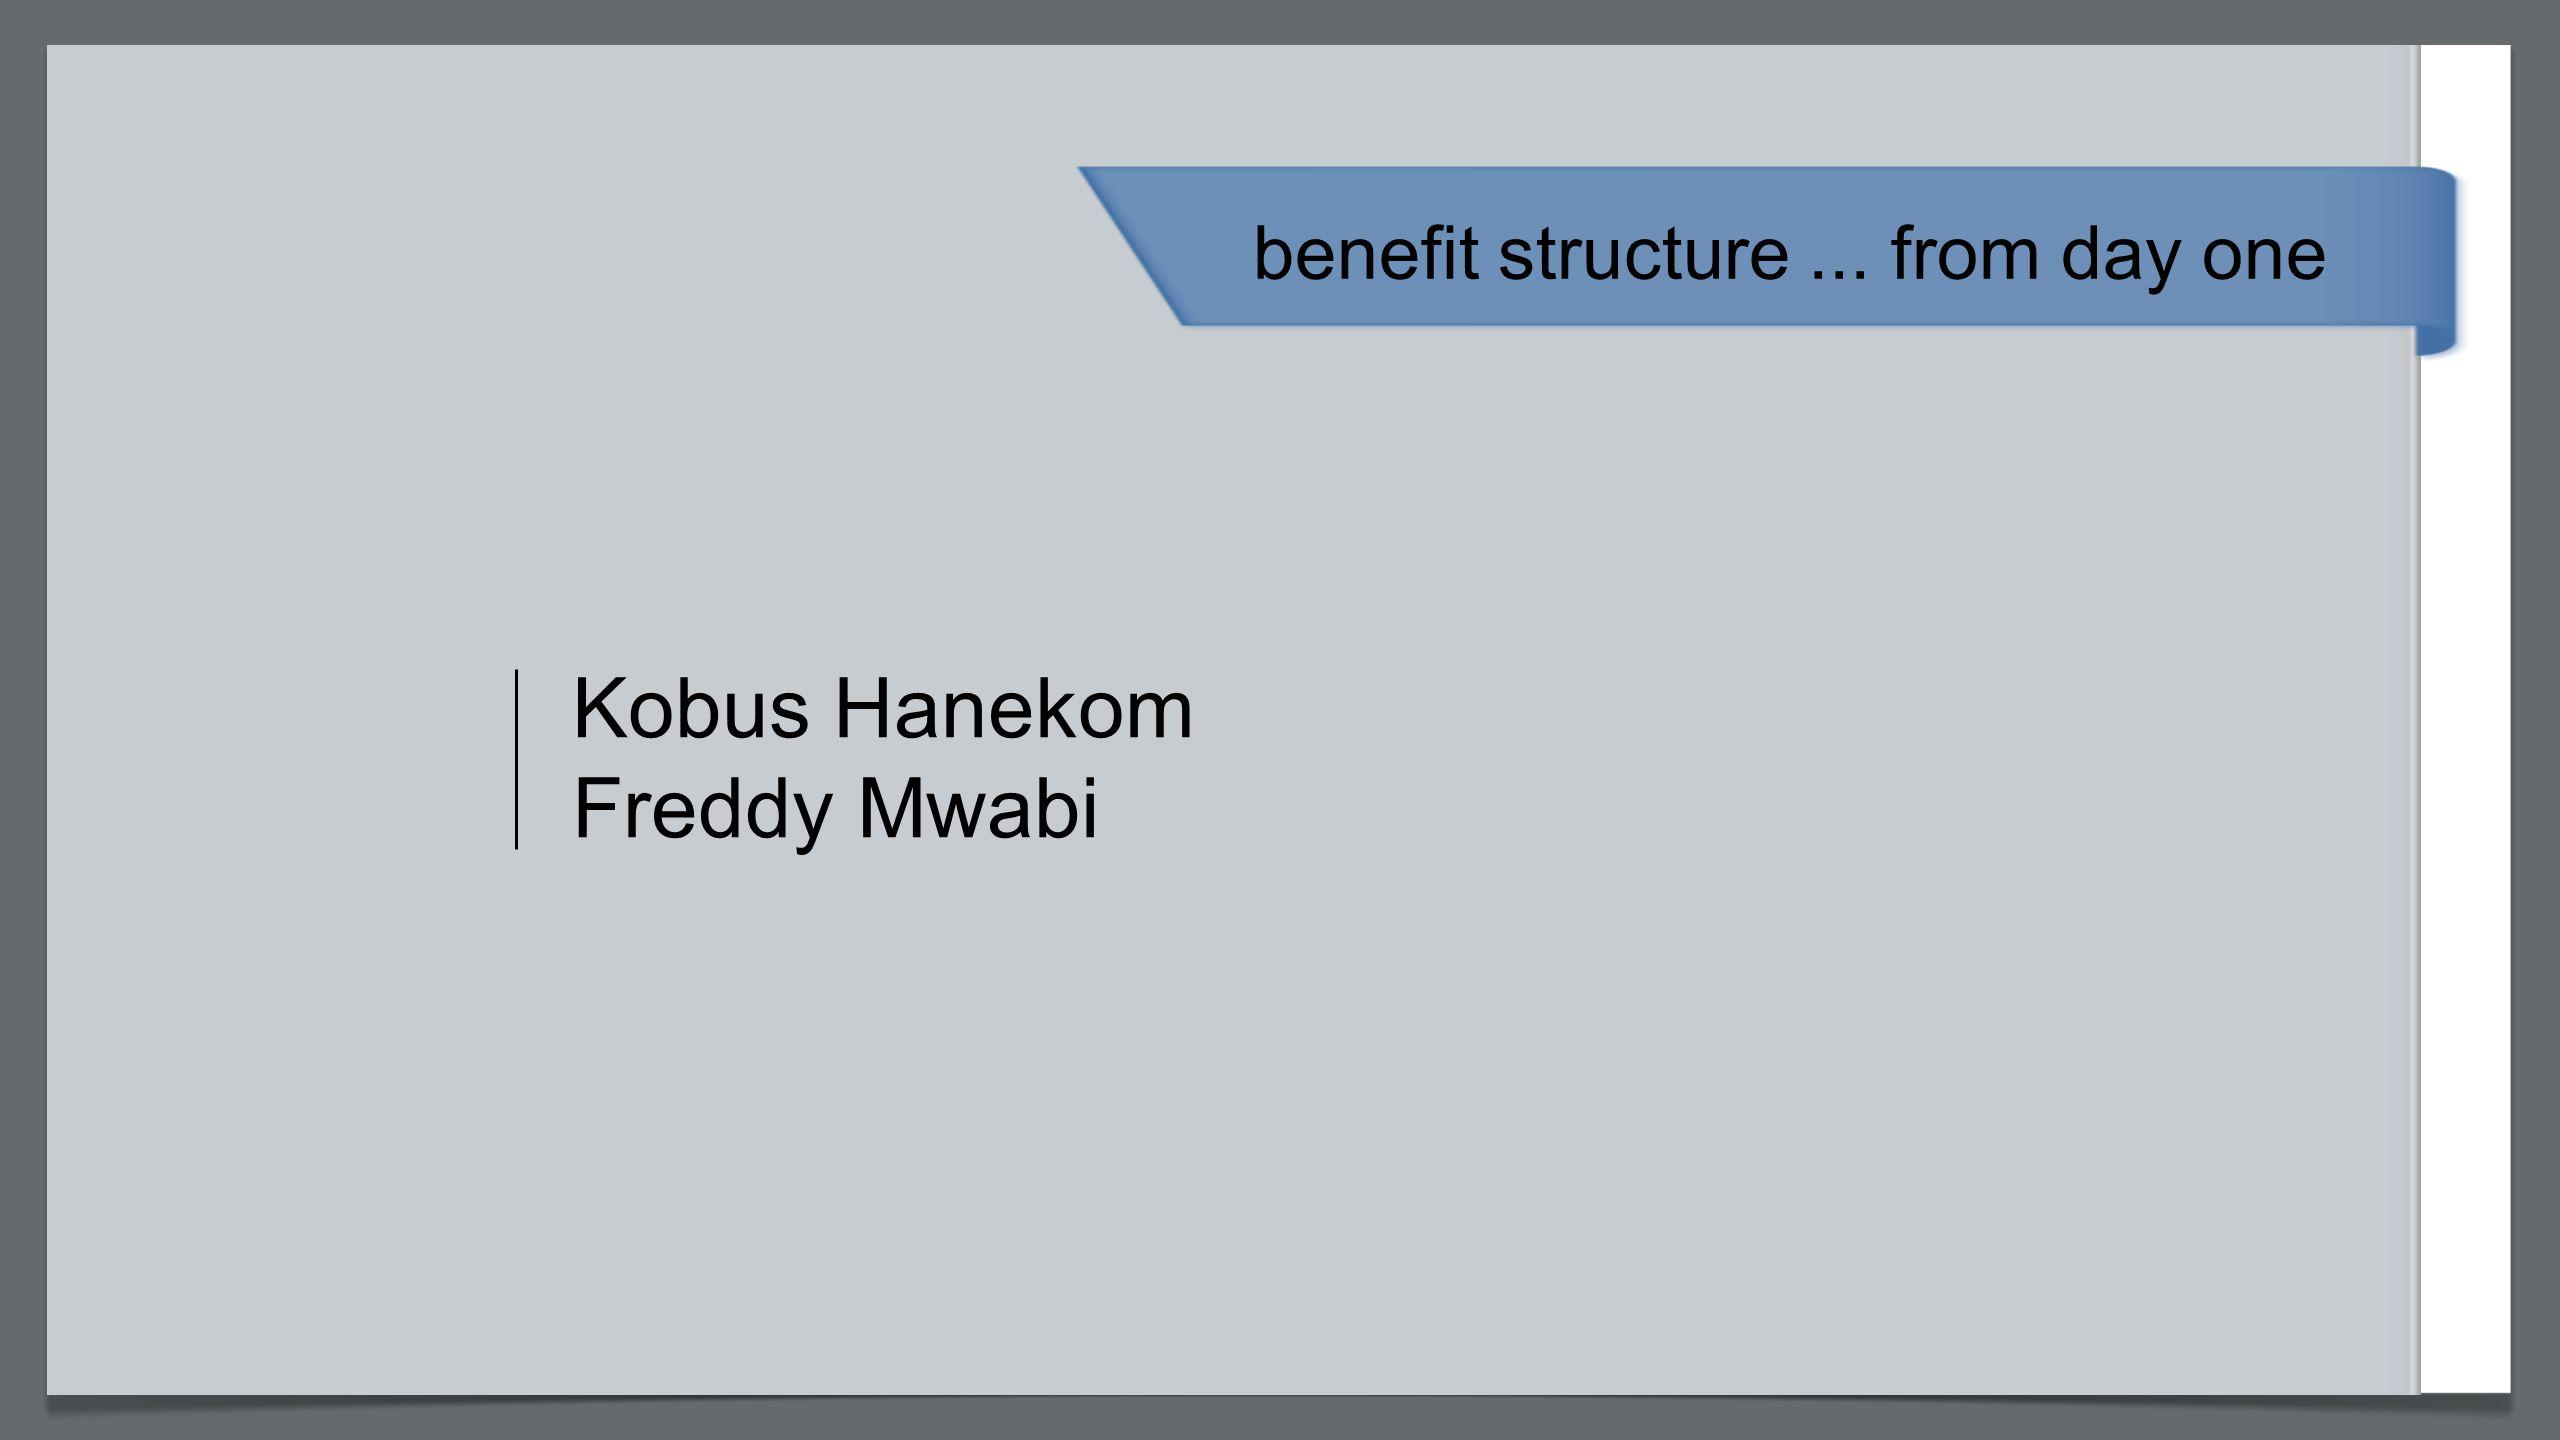 Kobus Hanekom Freddy Mwabi benefit structure... from day one